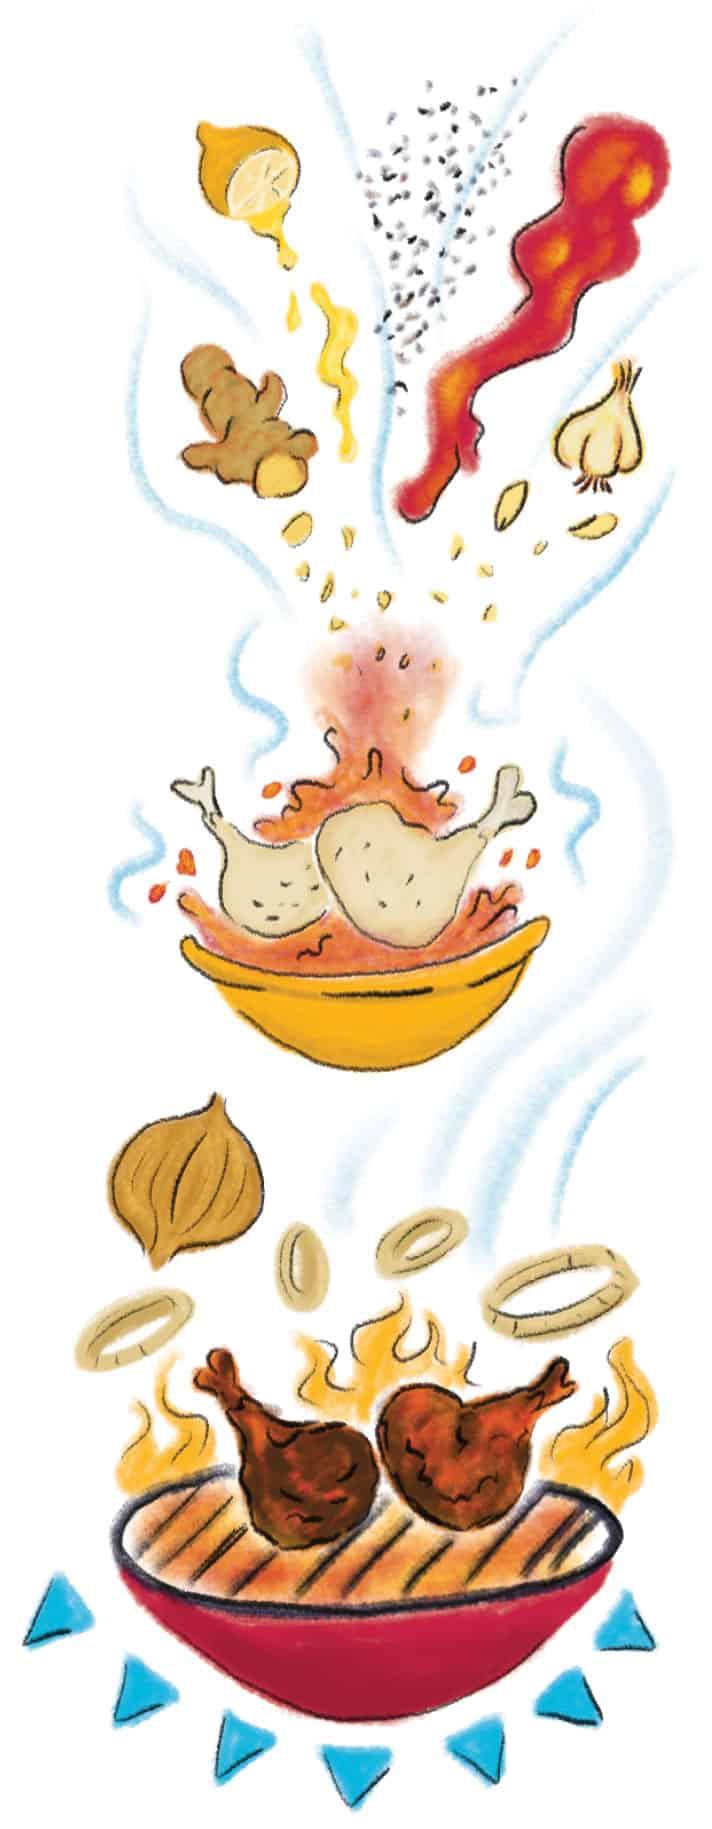 Togolese-Chicken-recipe-illustration